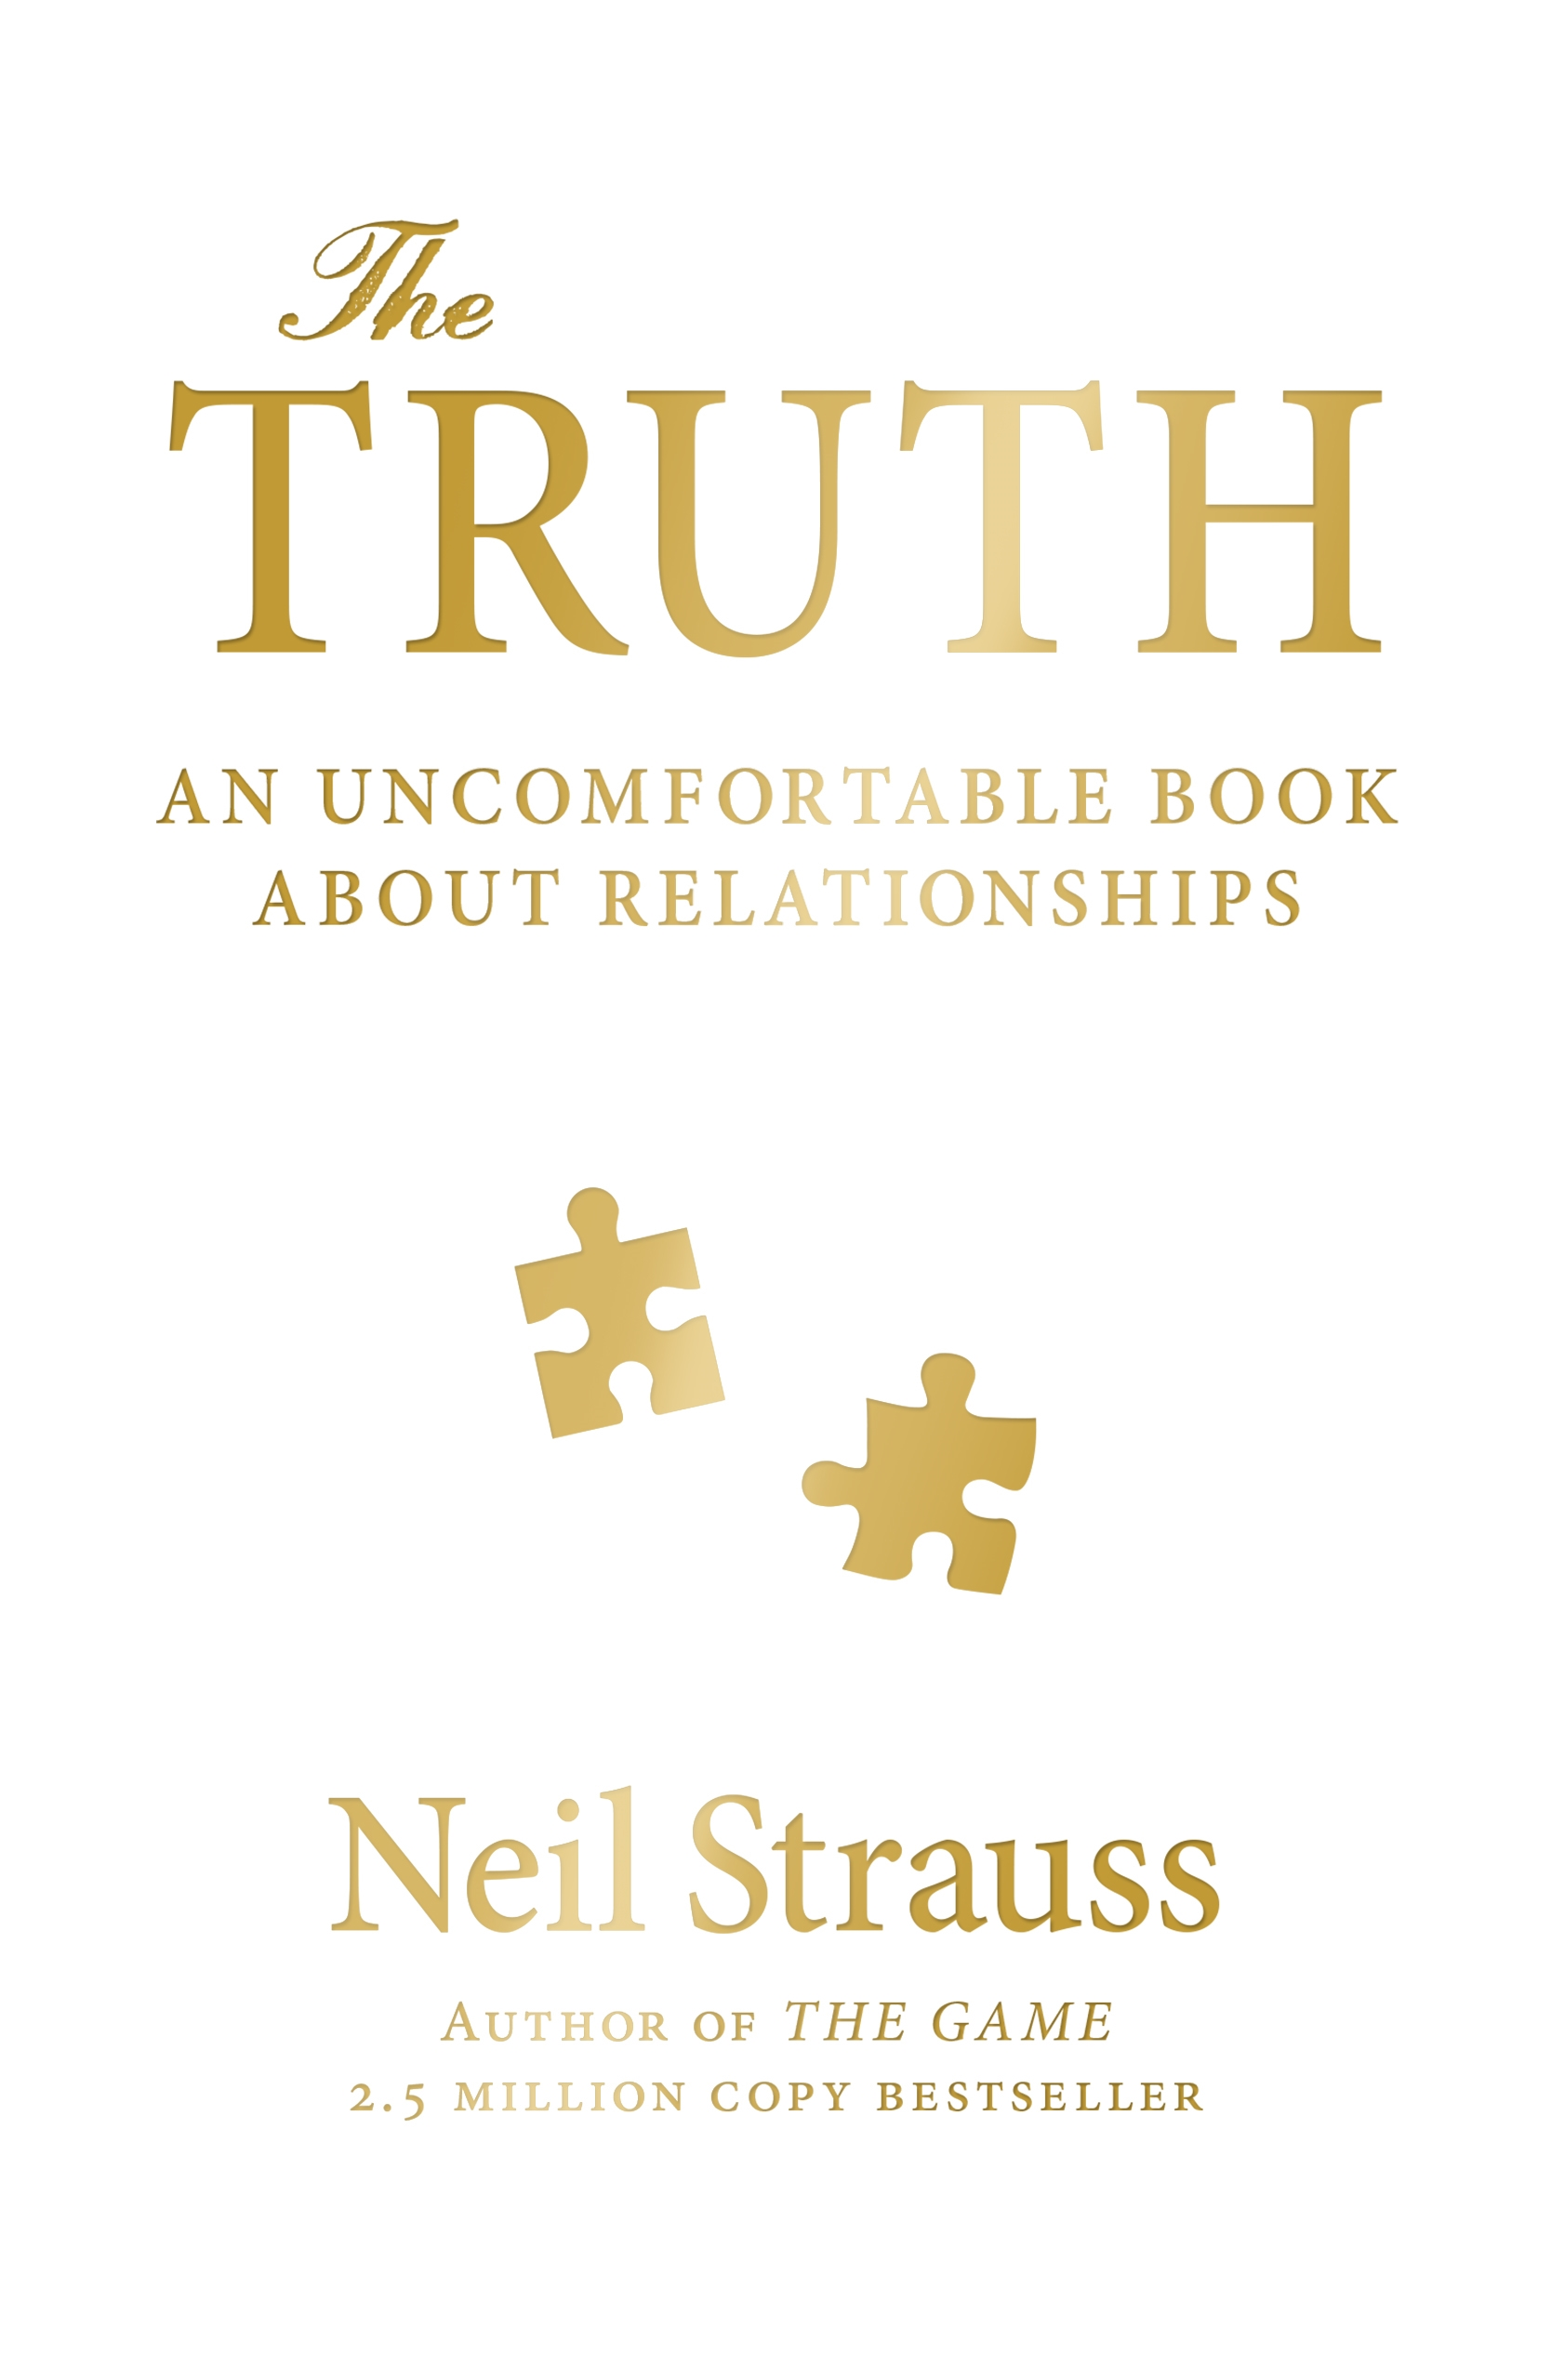 the-truth-neil-strauss-book-cover.jpg